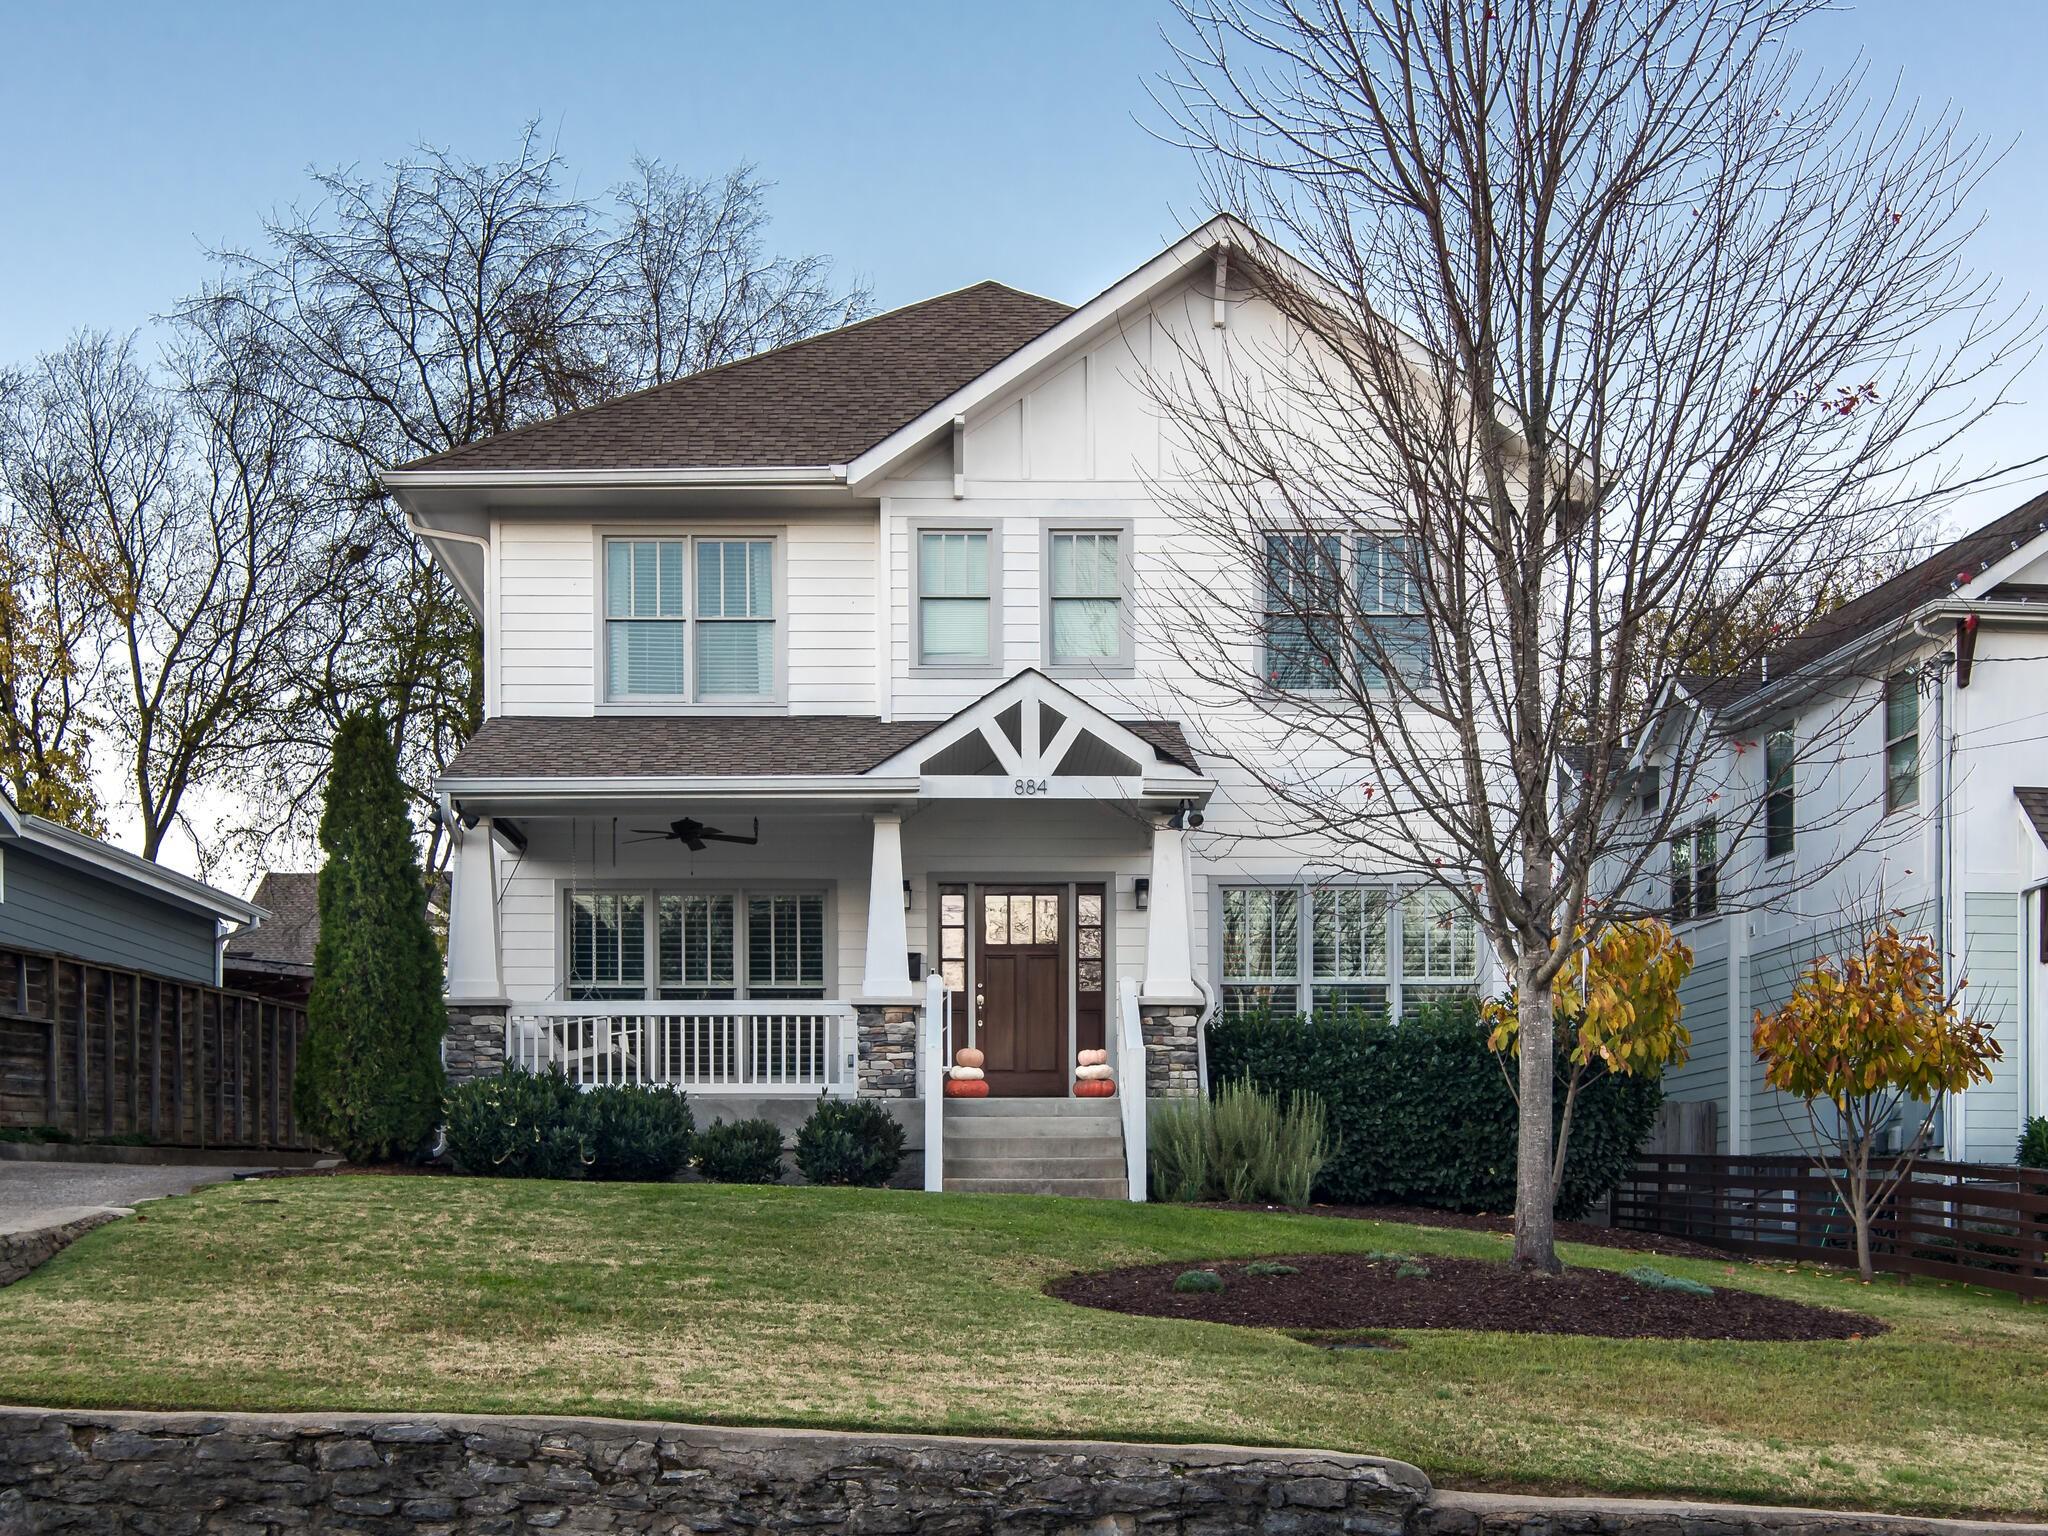 884 Montrose Ave Property Photo - Nashville, TN real estate listing